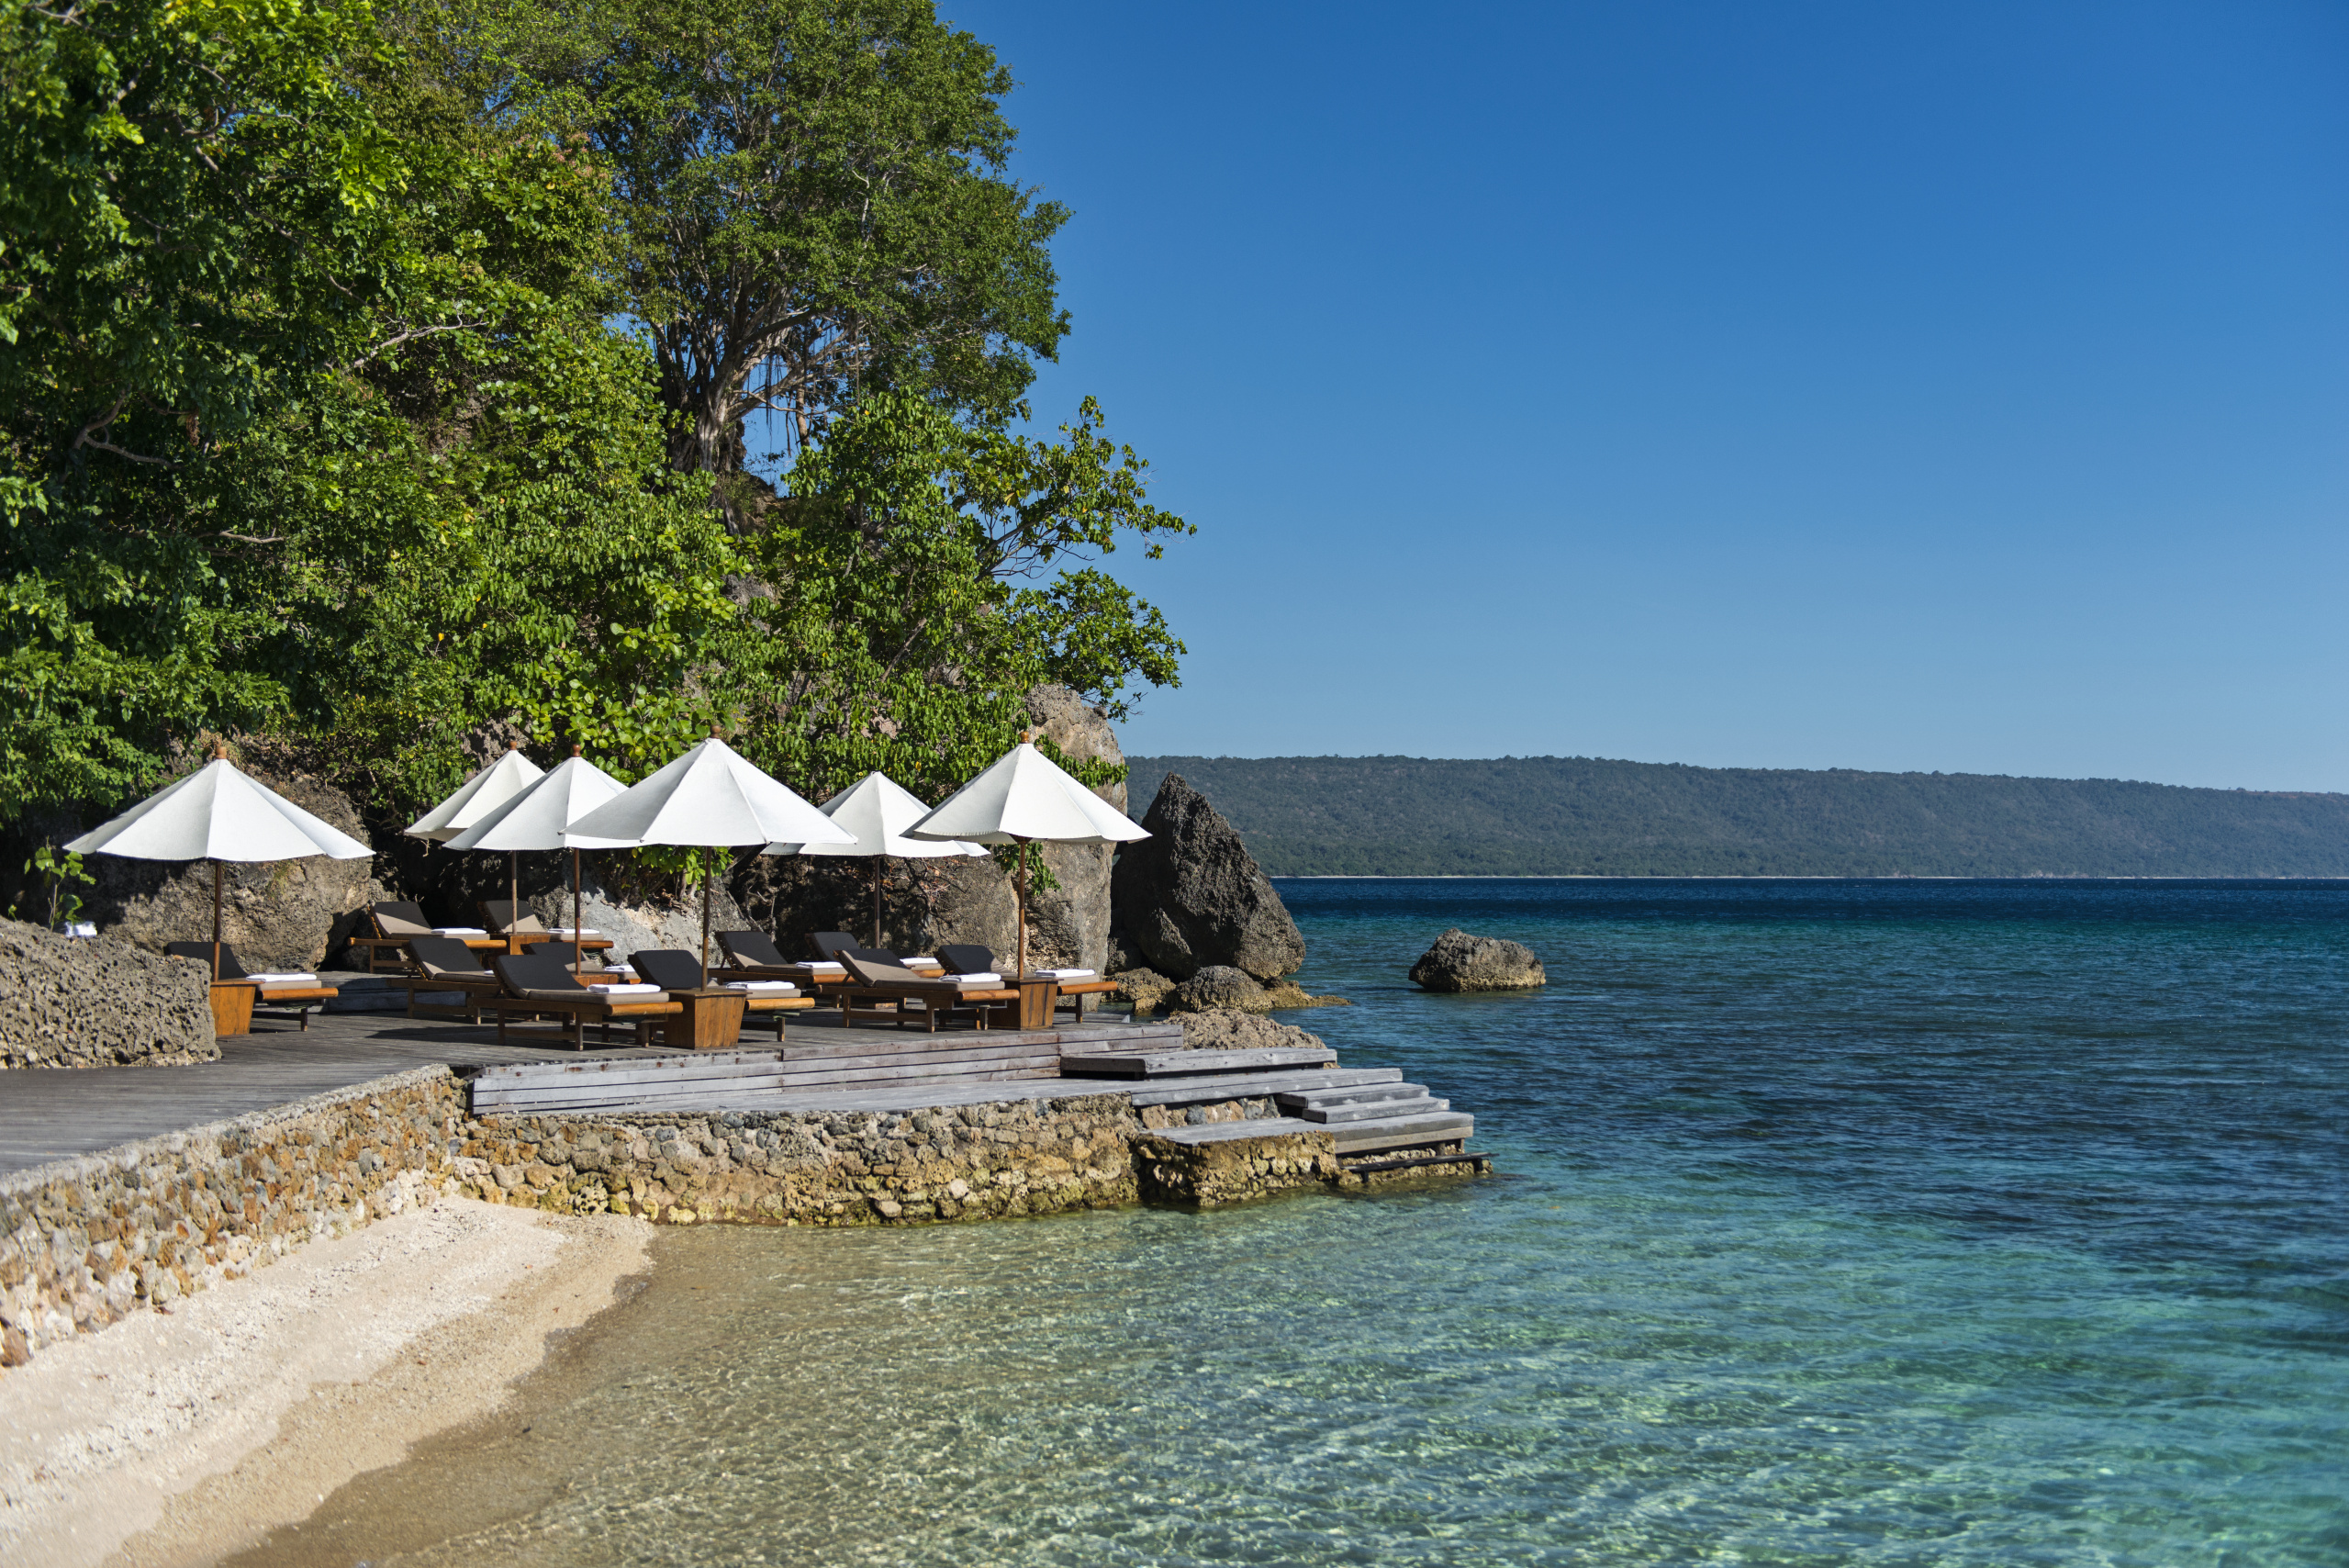 amanwana-moyo-island-beach